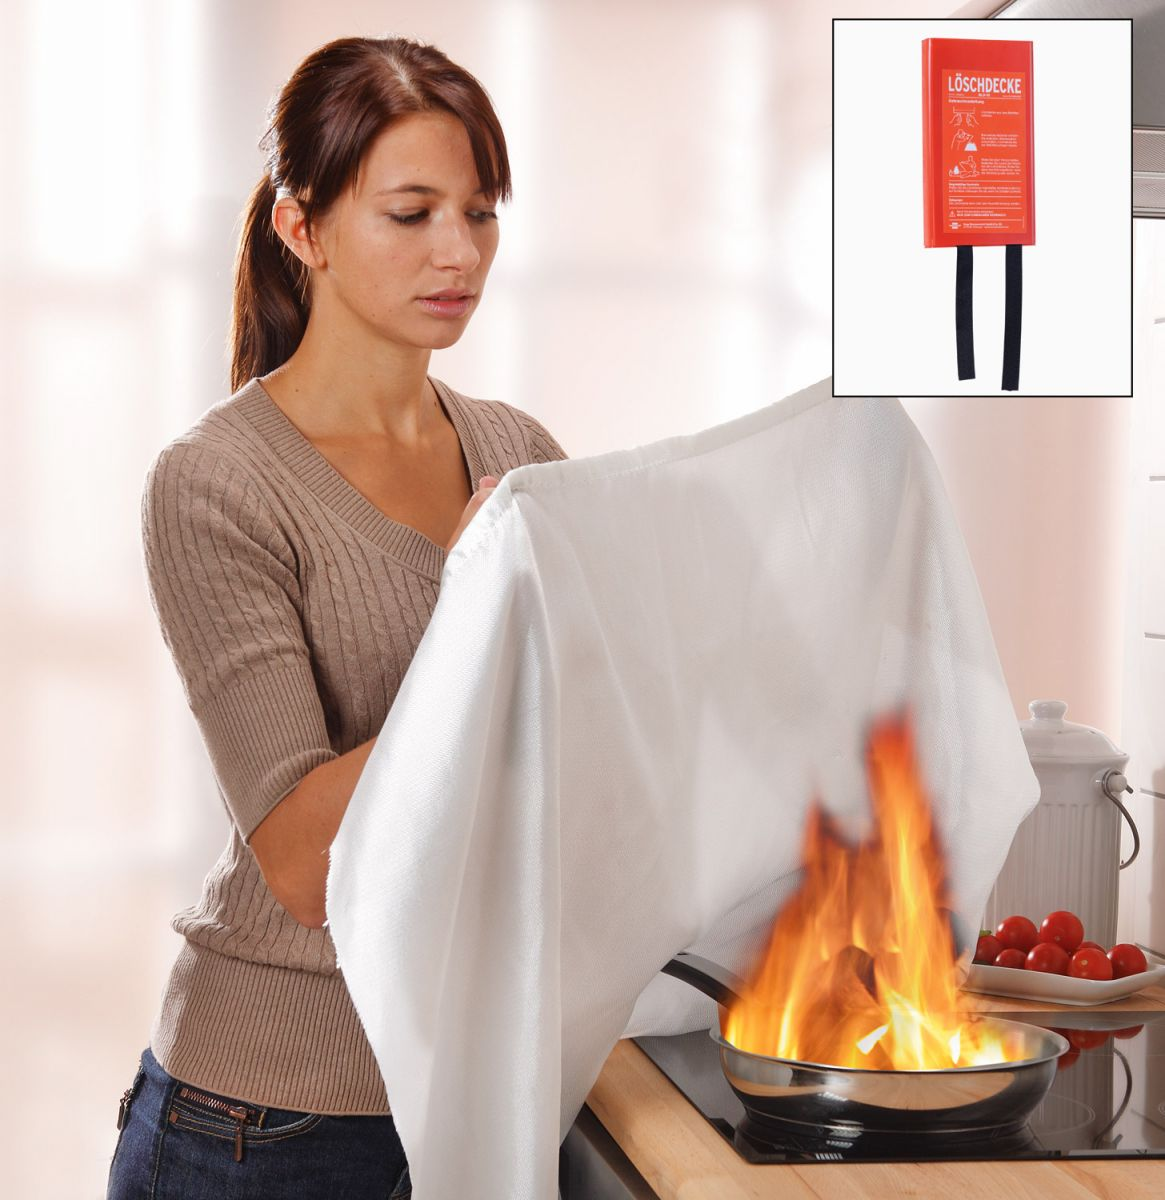 Blusdeken - Brandblussers.nu - Erkende brandblussers: www.brandblussers.nu/nl/cms/blusdeken